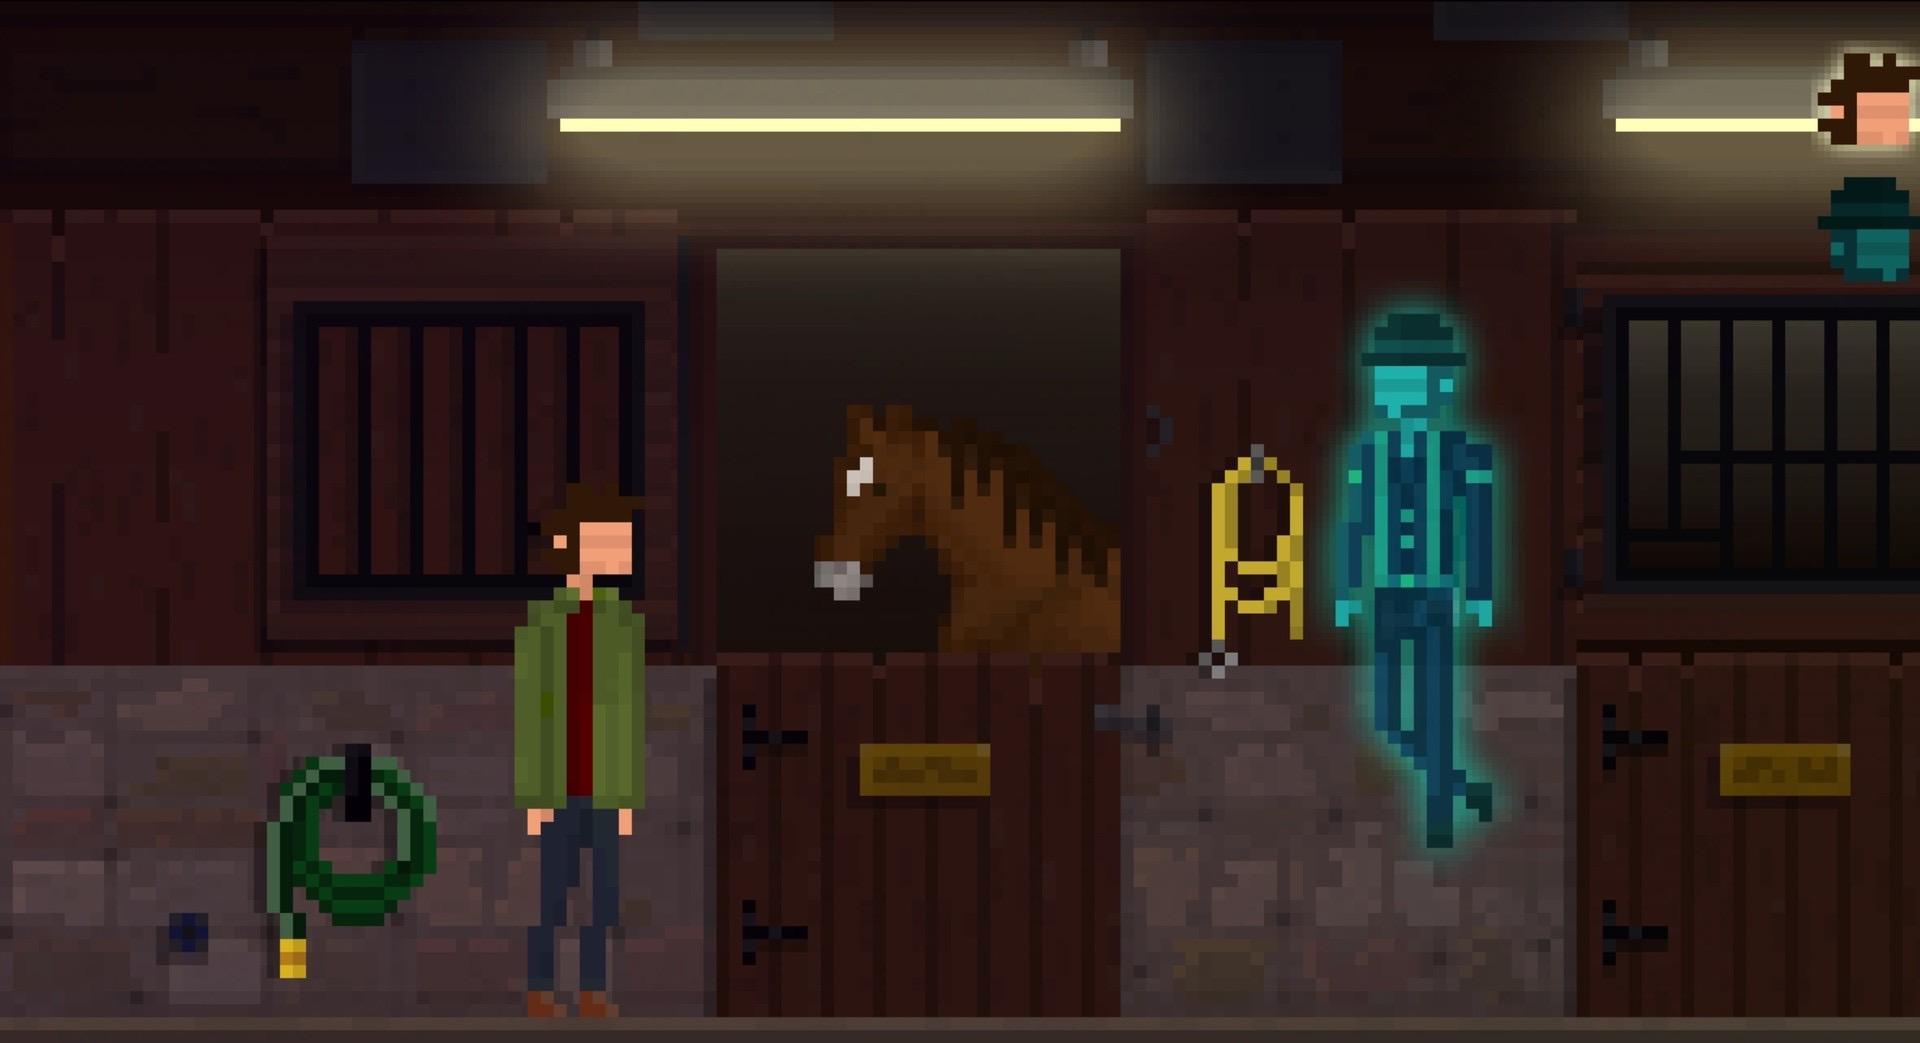 Screenshot 2 of The Phantom Fellows (Demo) width=